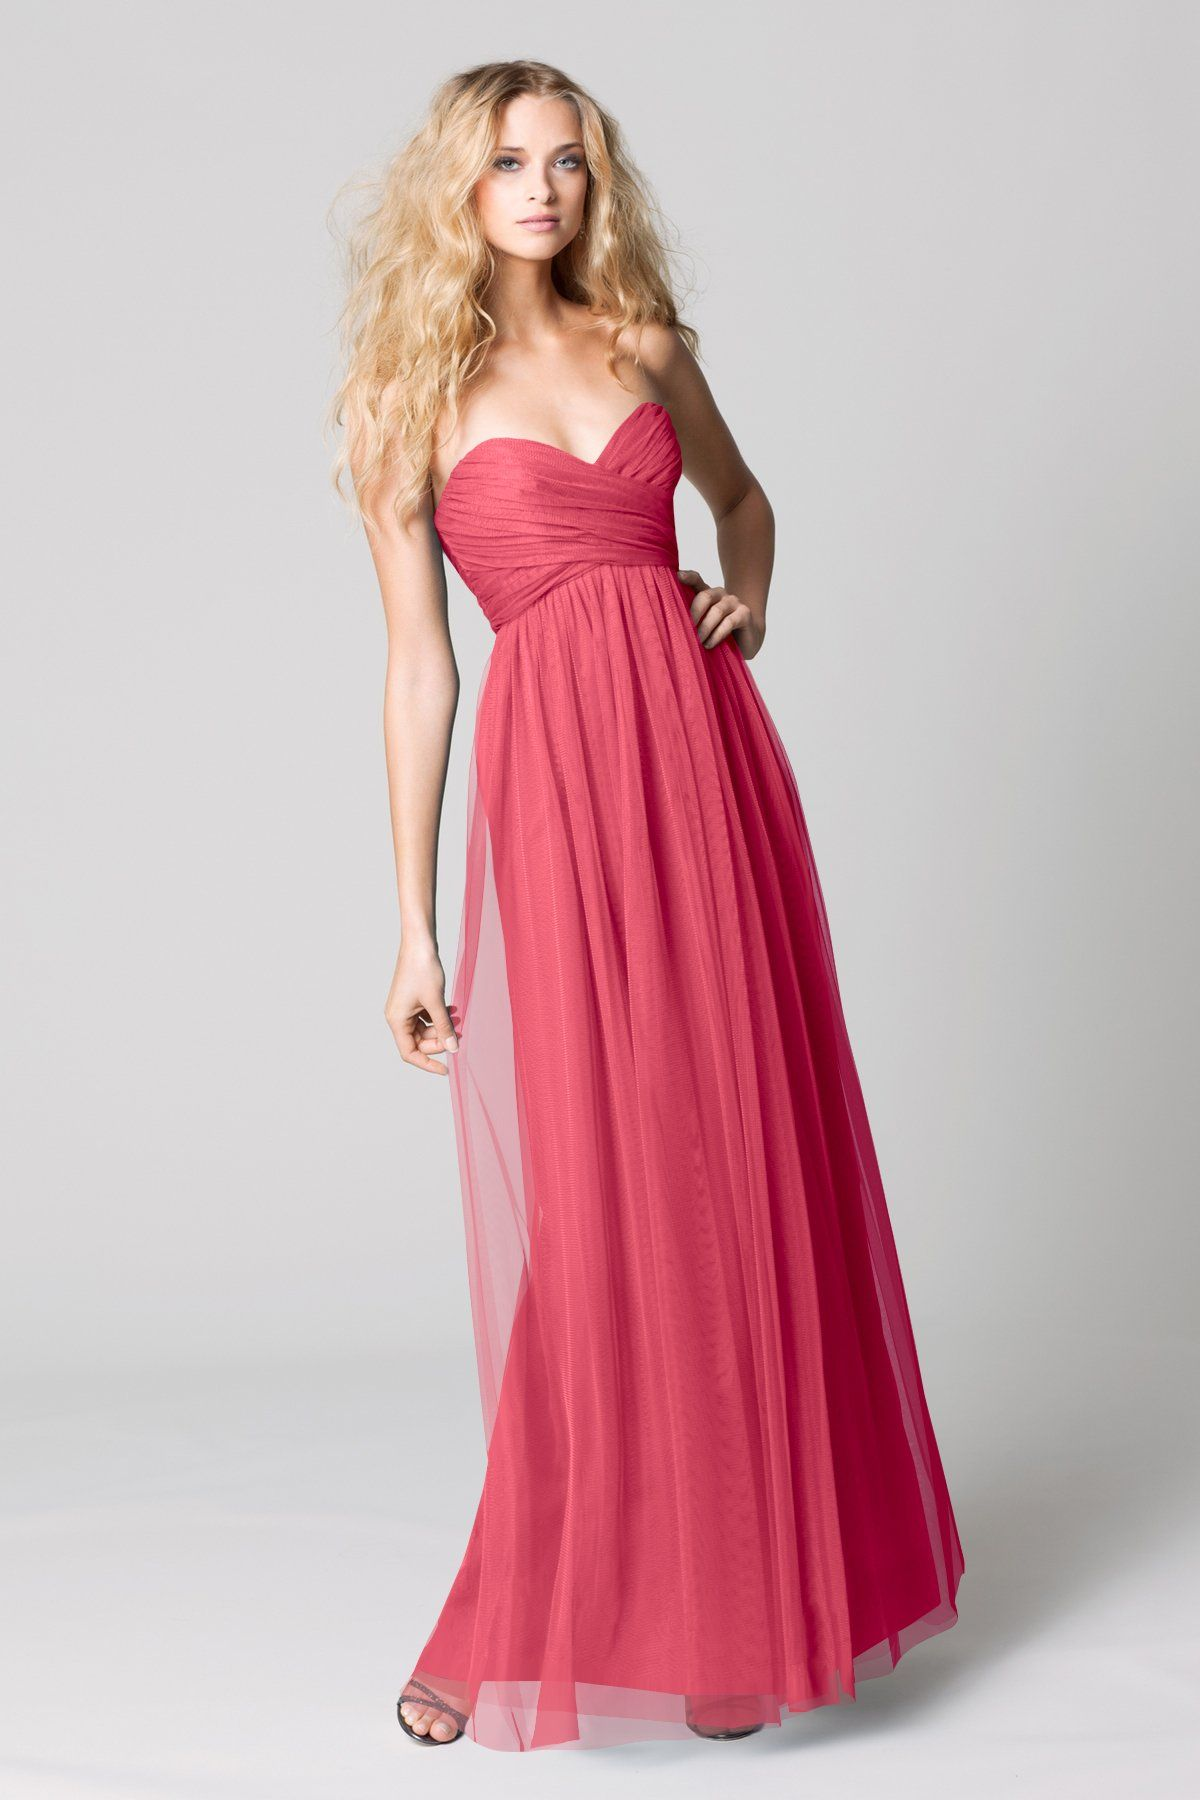 Moderno Vestidos De Dama Exóticos Componente - Colección de Vestidos ...